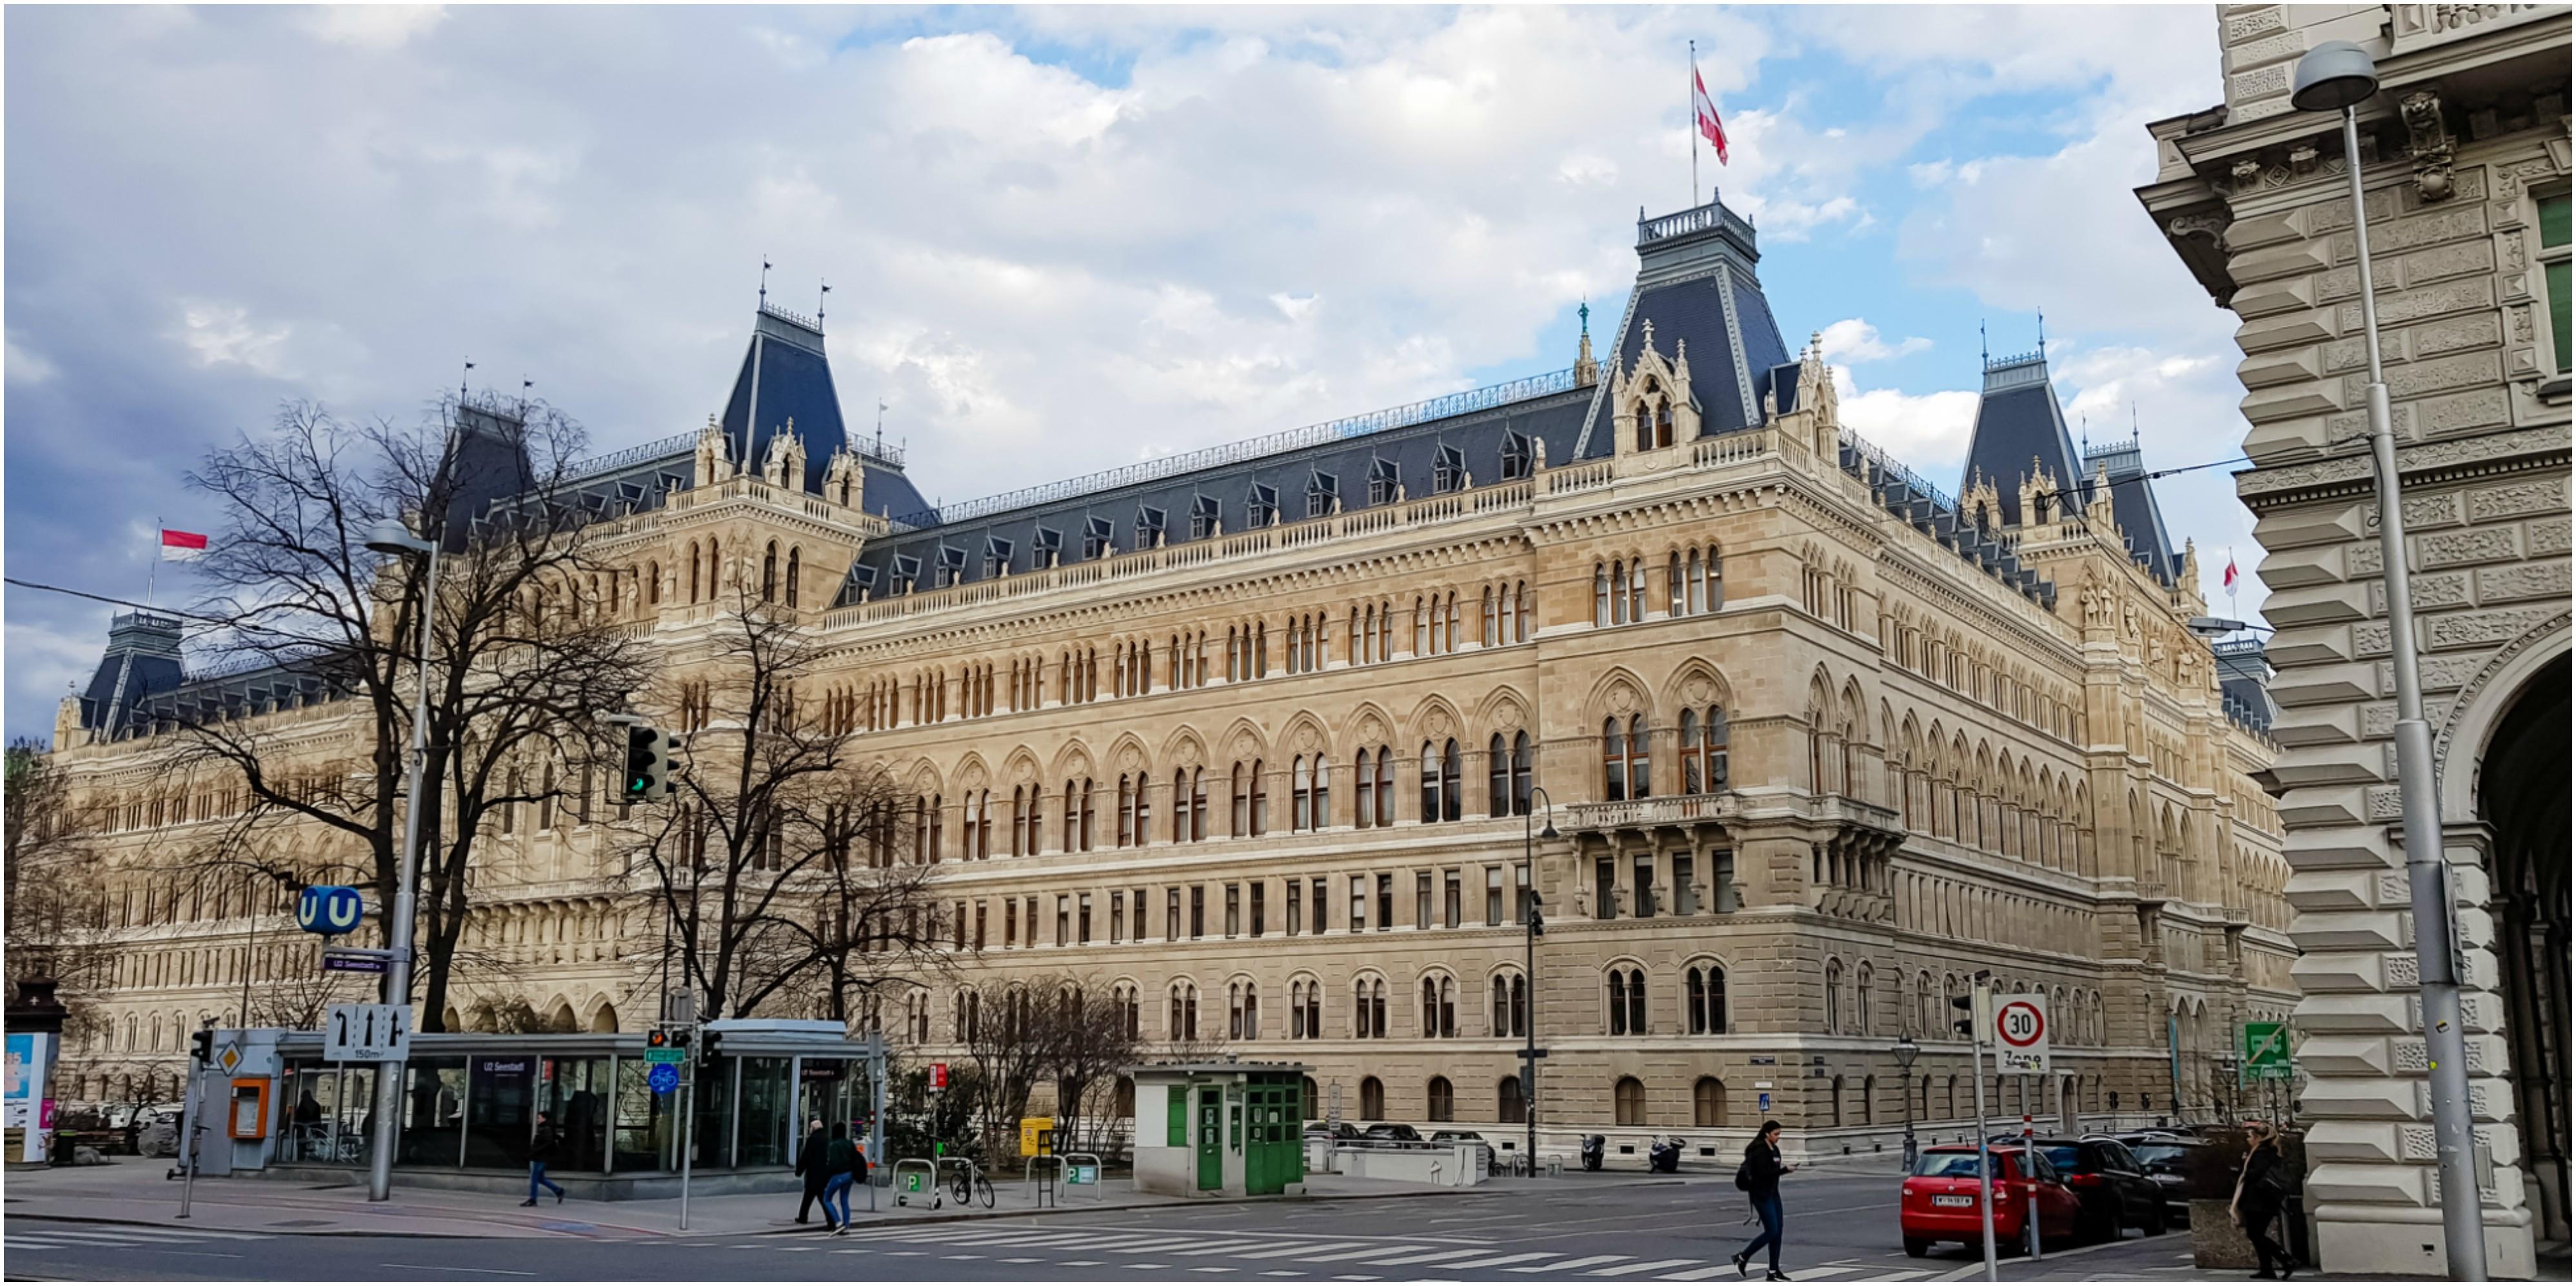 rathaus-wien-blog-voyage-3-jours-Vienne-Autriche